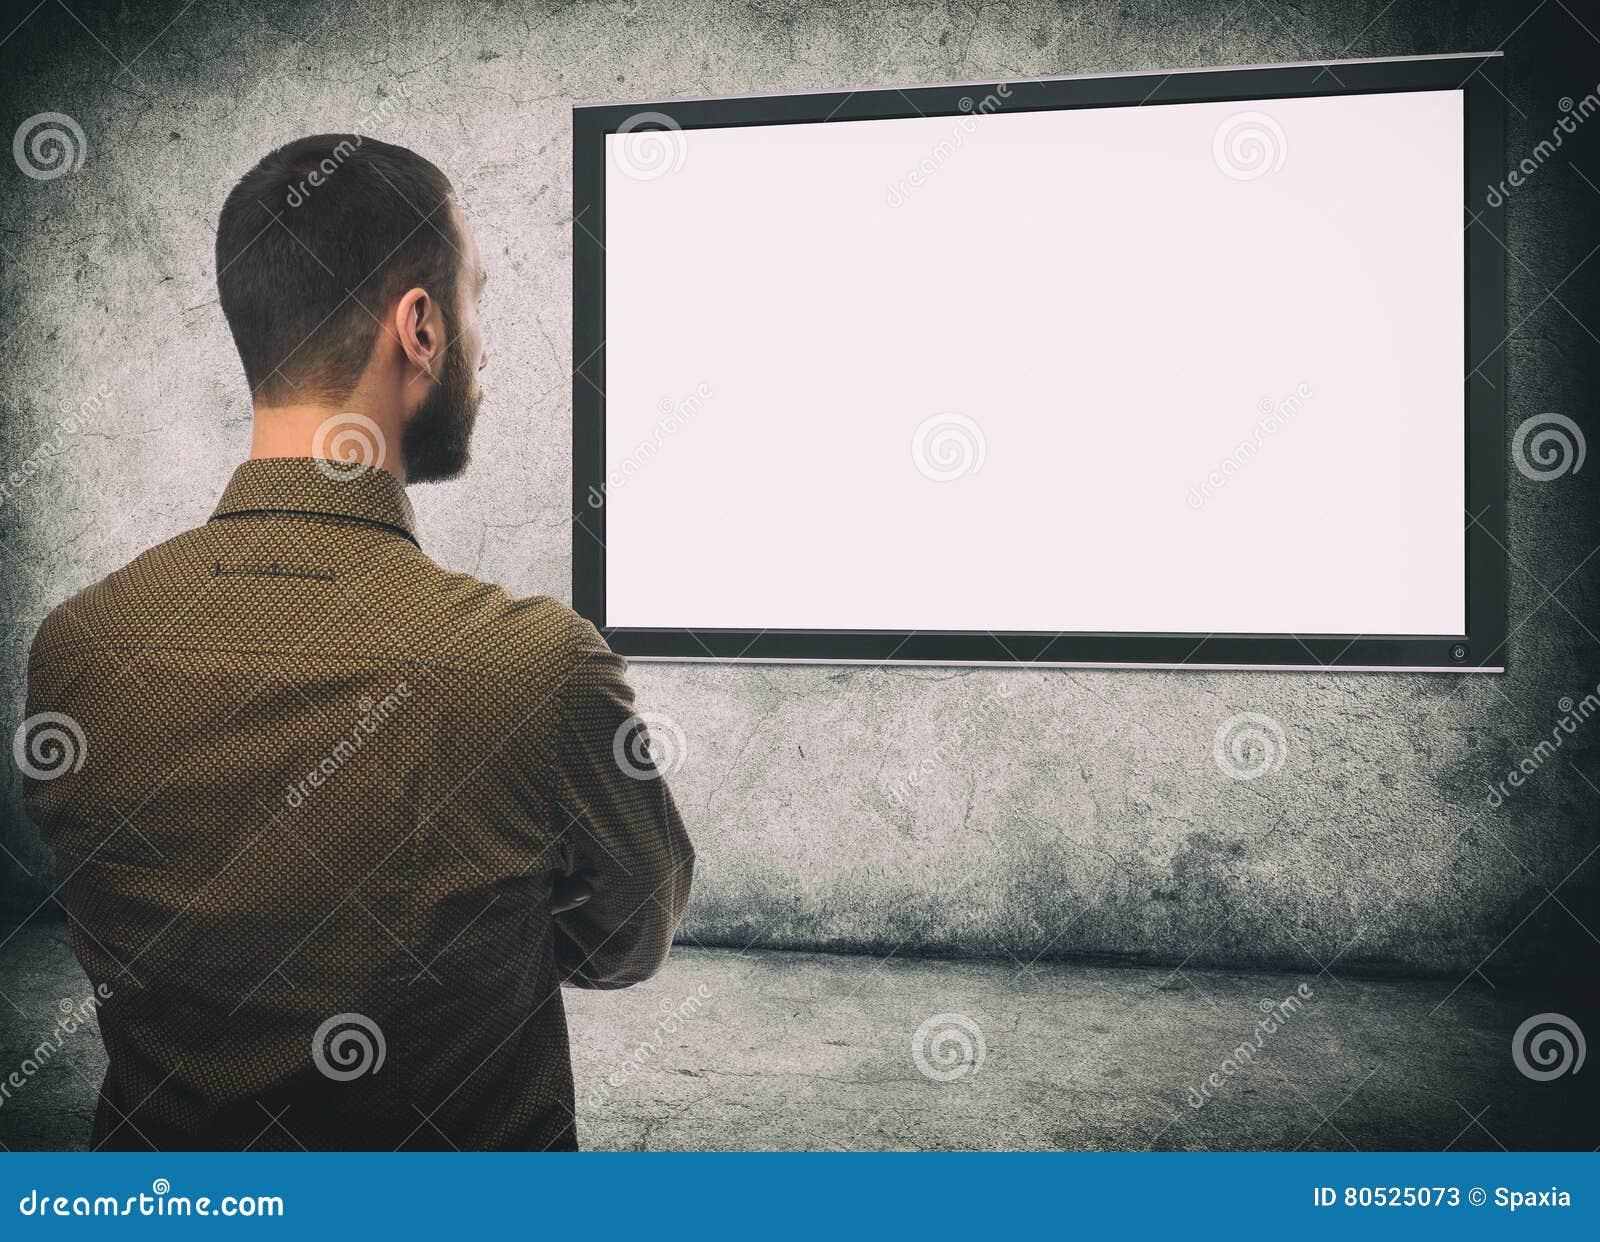 Vue Arriere De Type Barbu Regardant La Tv Image Stock Image Du